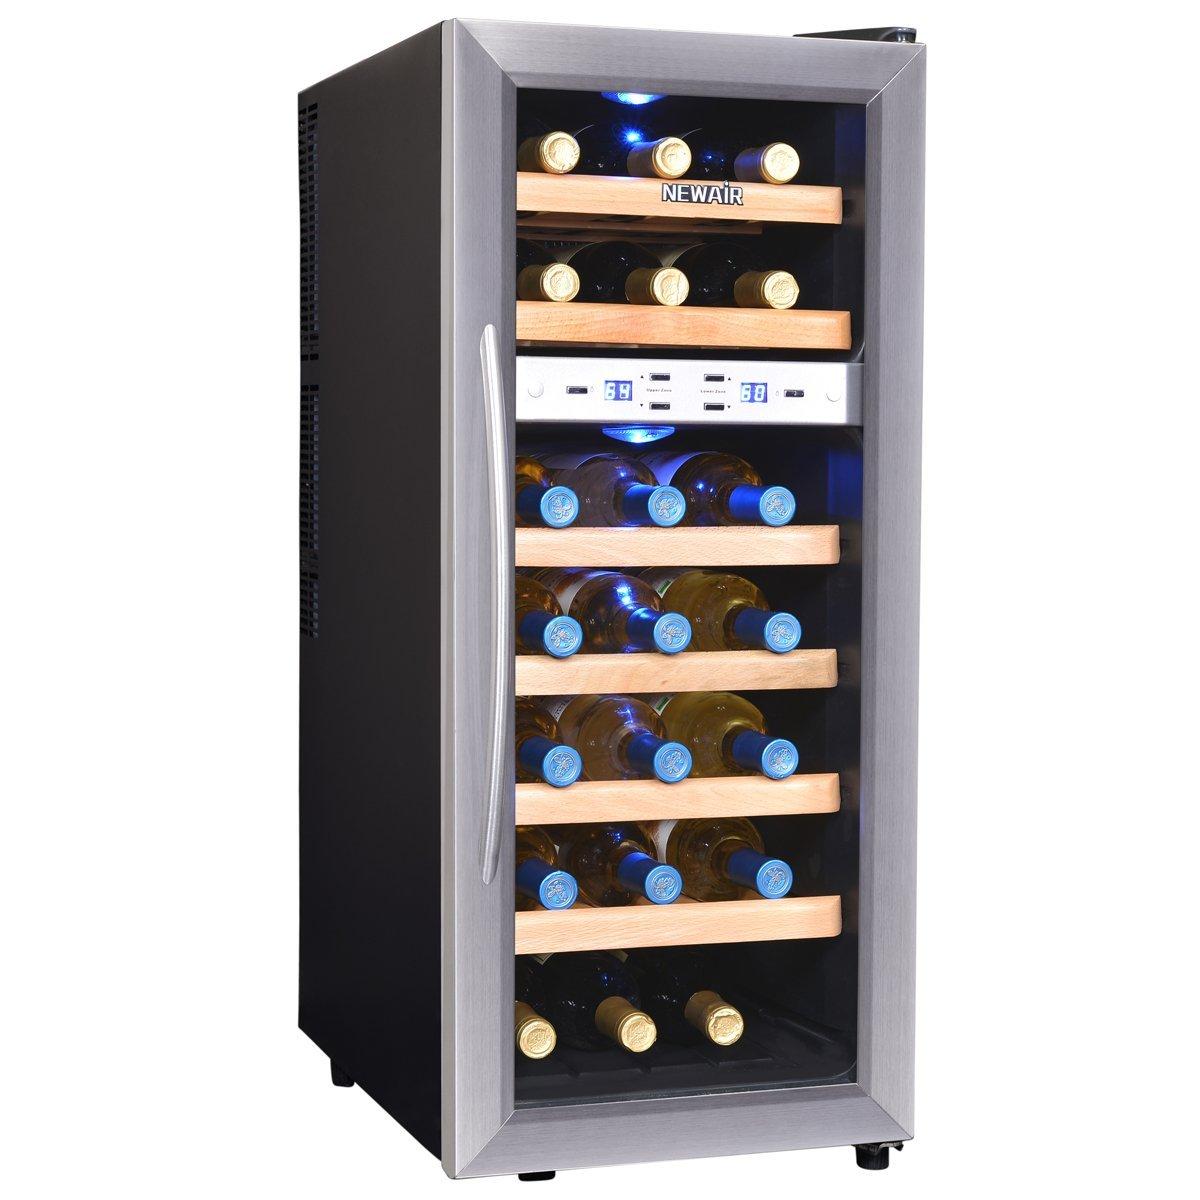 NewAir 21 Bottle Capacity Dual Zone Wine Cooler Fridge Renewed